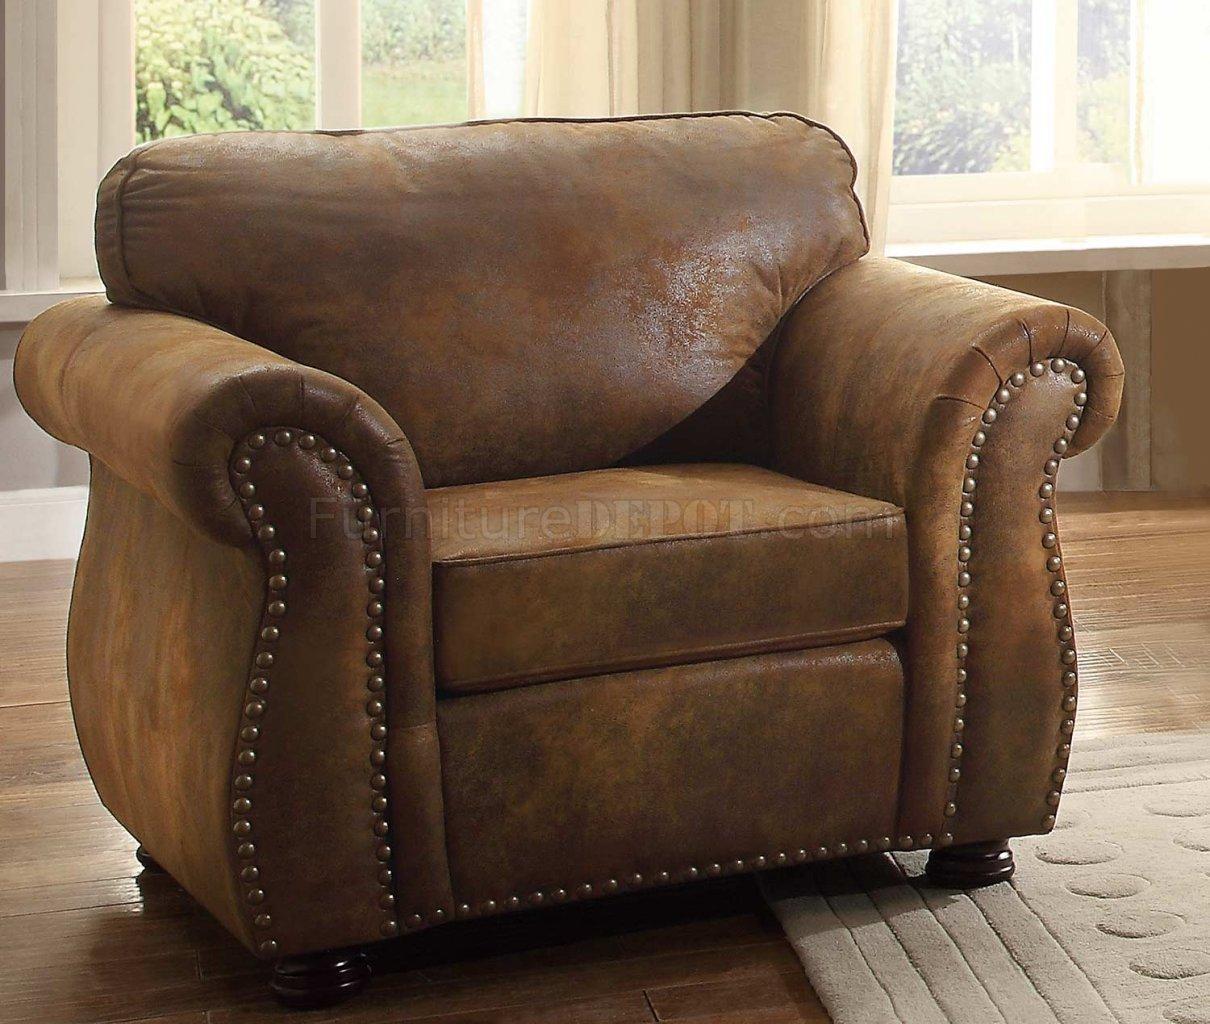 Sofa 8405BJ in Brown by Homelegance w/Options